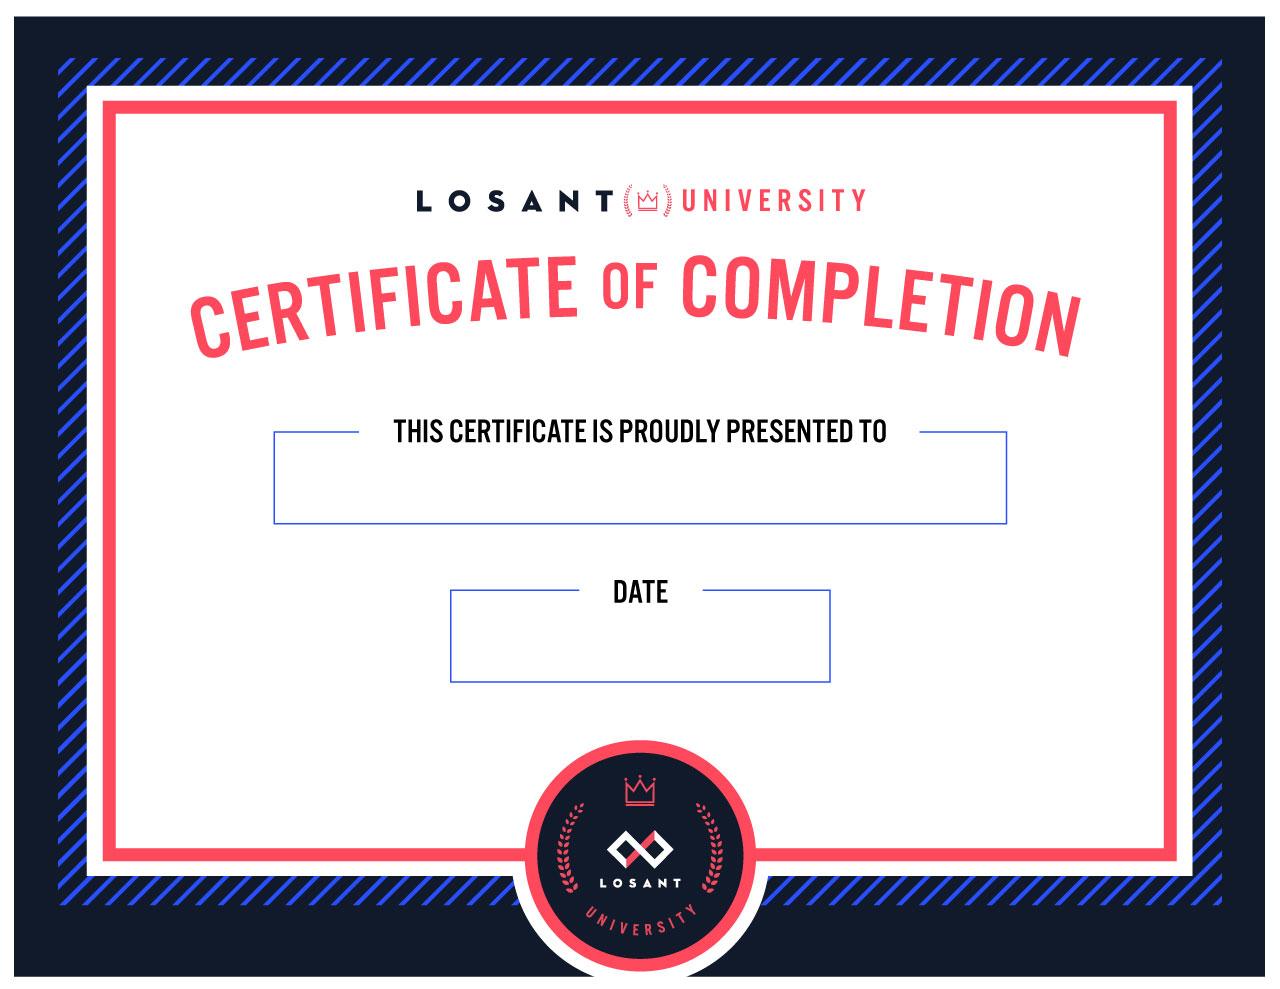 Losant University Certificate